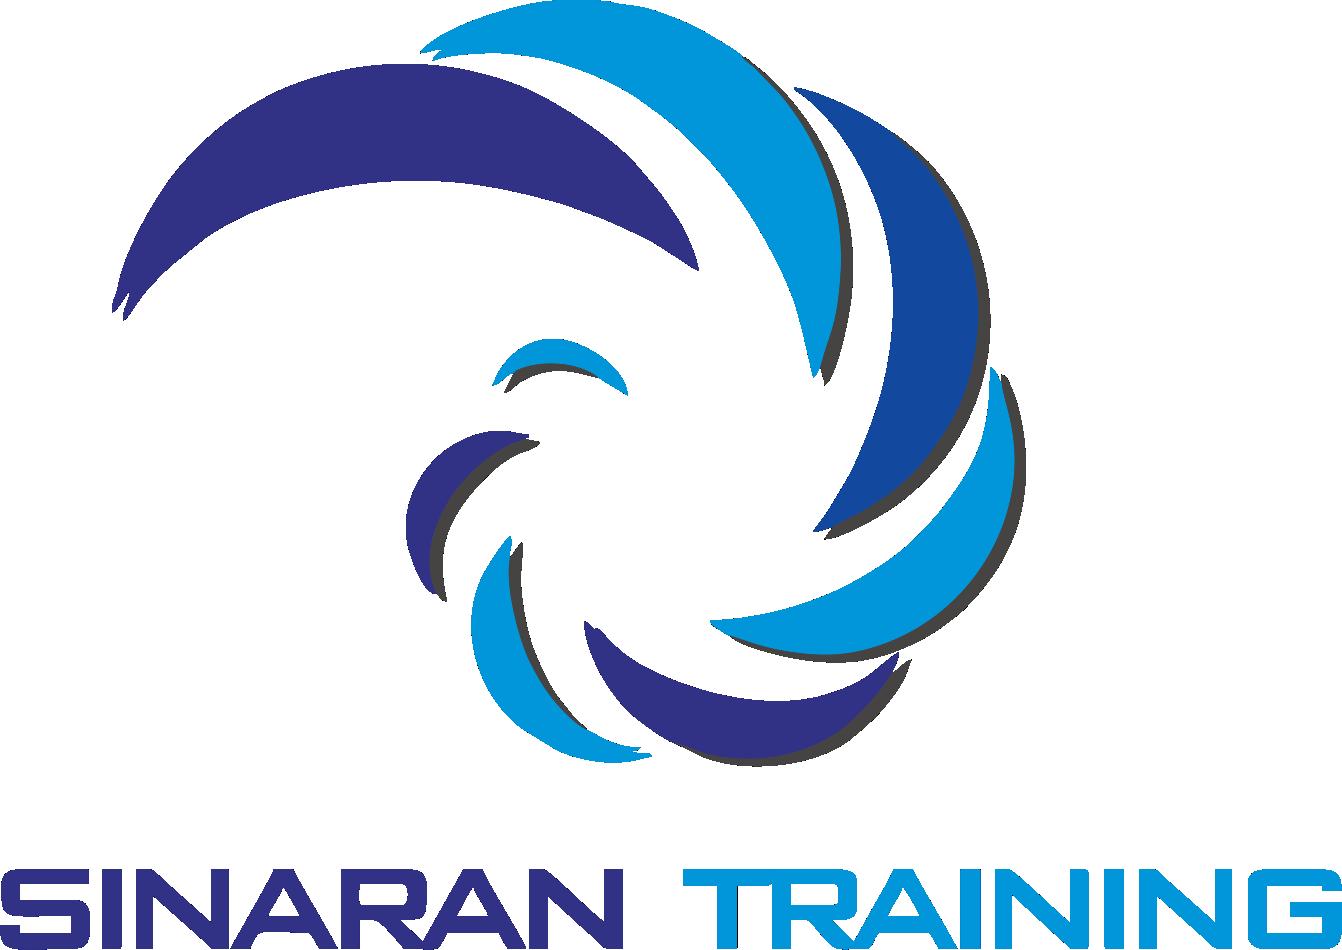 training HEATING VENTILATION AIR CONDITIONIN SYSTEM AND PLC CONTROL ,pelatihan HEATING VENTILATION AIR CONDITIONIN SYSTEM AND PLC CONTROL ,training HEATING VENTILATION AIR CONDITIONIN SYSTEM AND PLC CONTROL Batam,training HEATING VENTILATION AIR CONDITIONIN SYSTEM AND PLC CONTROL Bandung,training HEATING VENTILATION AIR CONDITIONIN SYSTEM AND PLC CONTROL Jakarta,training HEATING VENTILATION AIR CONDITIONIN SYSTEM AND PLC CONTROL Jogja,training HEATING VENTILATION AIR CONDITIONIN SYSTEM AND PLC CONTROL Malang,training HEATING VENTILATION AIR CONDITIONIN SYSTEM AND PLC CONTROL Surabaya,training HEATING VENTILATION AIR CONDITIONIN SYSTEM AND PLC CONTROL Bali,training HEATING VENTILATION AIR CONDITIONIN SYSTEM AND PLC CONTROL Lombok,pelatihan HEATING VENTILATION AIR CONDITIONIN SYSTEM AND PLC CONTROL Batam,pelatihan HEATING VENTILATION AIR CONDITIONIN SYSTEM AND PLC CONTROL Bandung,pelatihan HEATING VENTILATION AIR CONDITIONIN SYSTEM AND PLC CONTROL Jakarta,pelatihan HEATING VENTILATION AIR CONDITIONIN SYSTEM AND PLC CONTROL Jogja,pelatihan HEATING VENTILATION AIR CONDITIONIN SYSTEM AND PLC CONTROL Malang,pelatihan HEATING VENTILATION AIR CONDITIONIN SYSTEM AND PLC CONTROL Surabaya,pelatihan HEATING VENTILATION AIR CONDITIONIN SYSTEM AND PLC CONTROL Bali,pelatihan HEATING VENTILATION AIR CONDITIONIN SYSTEM AND PLC CONTROL Lombok